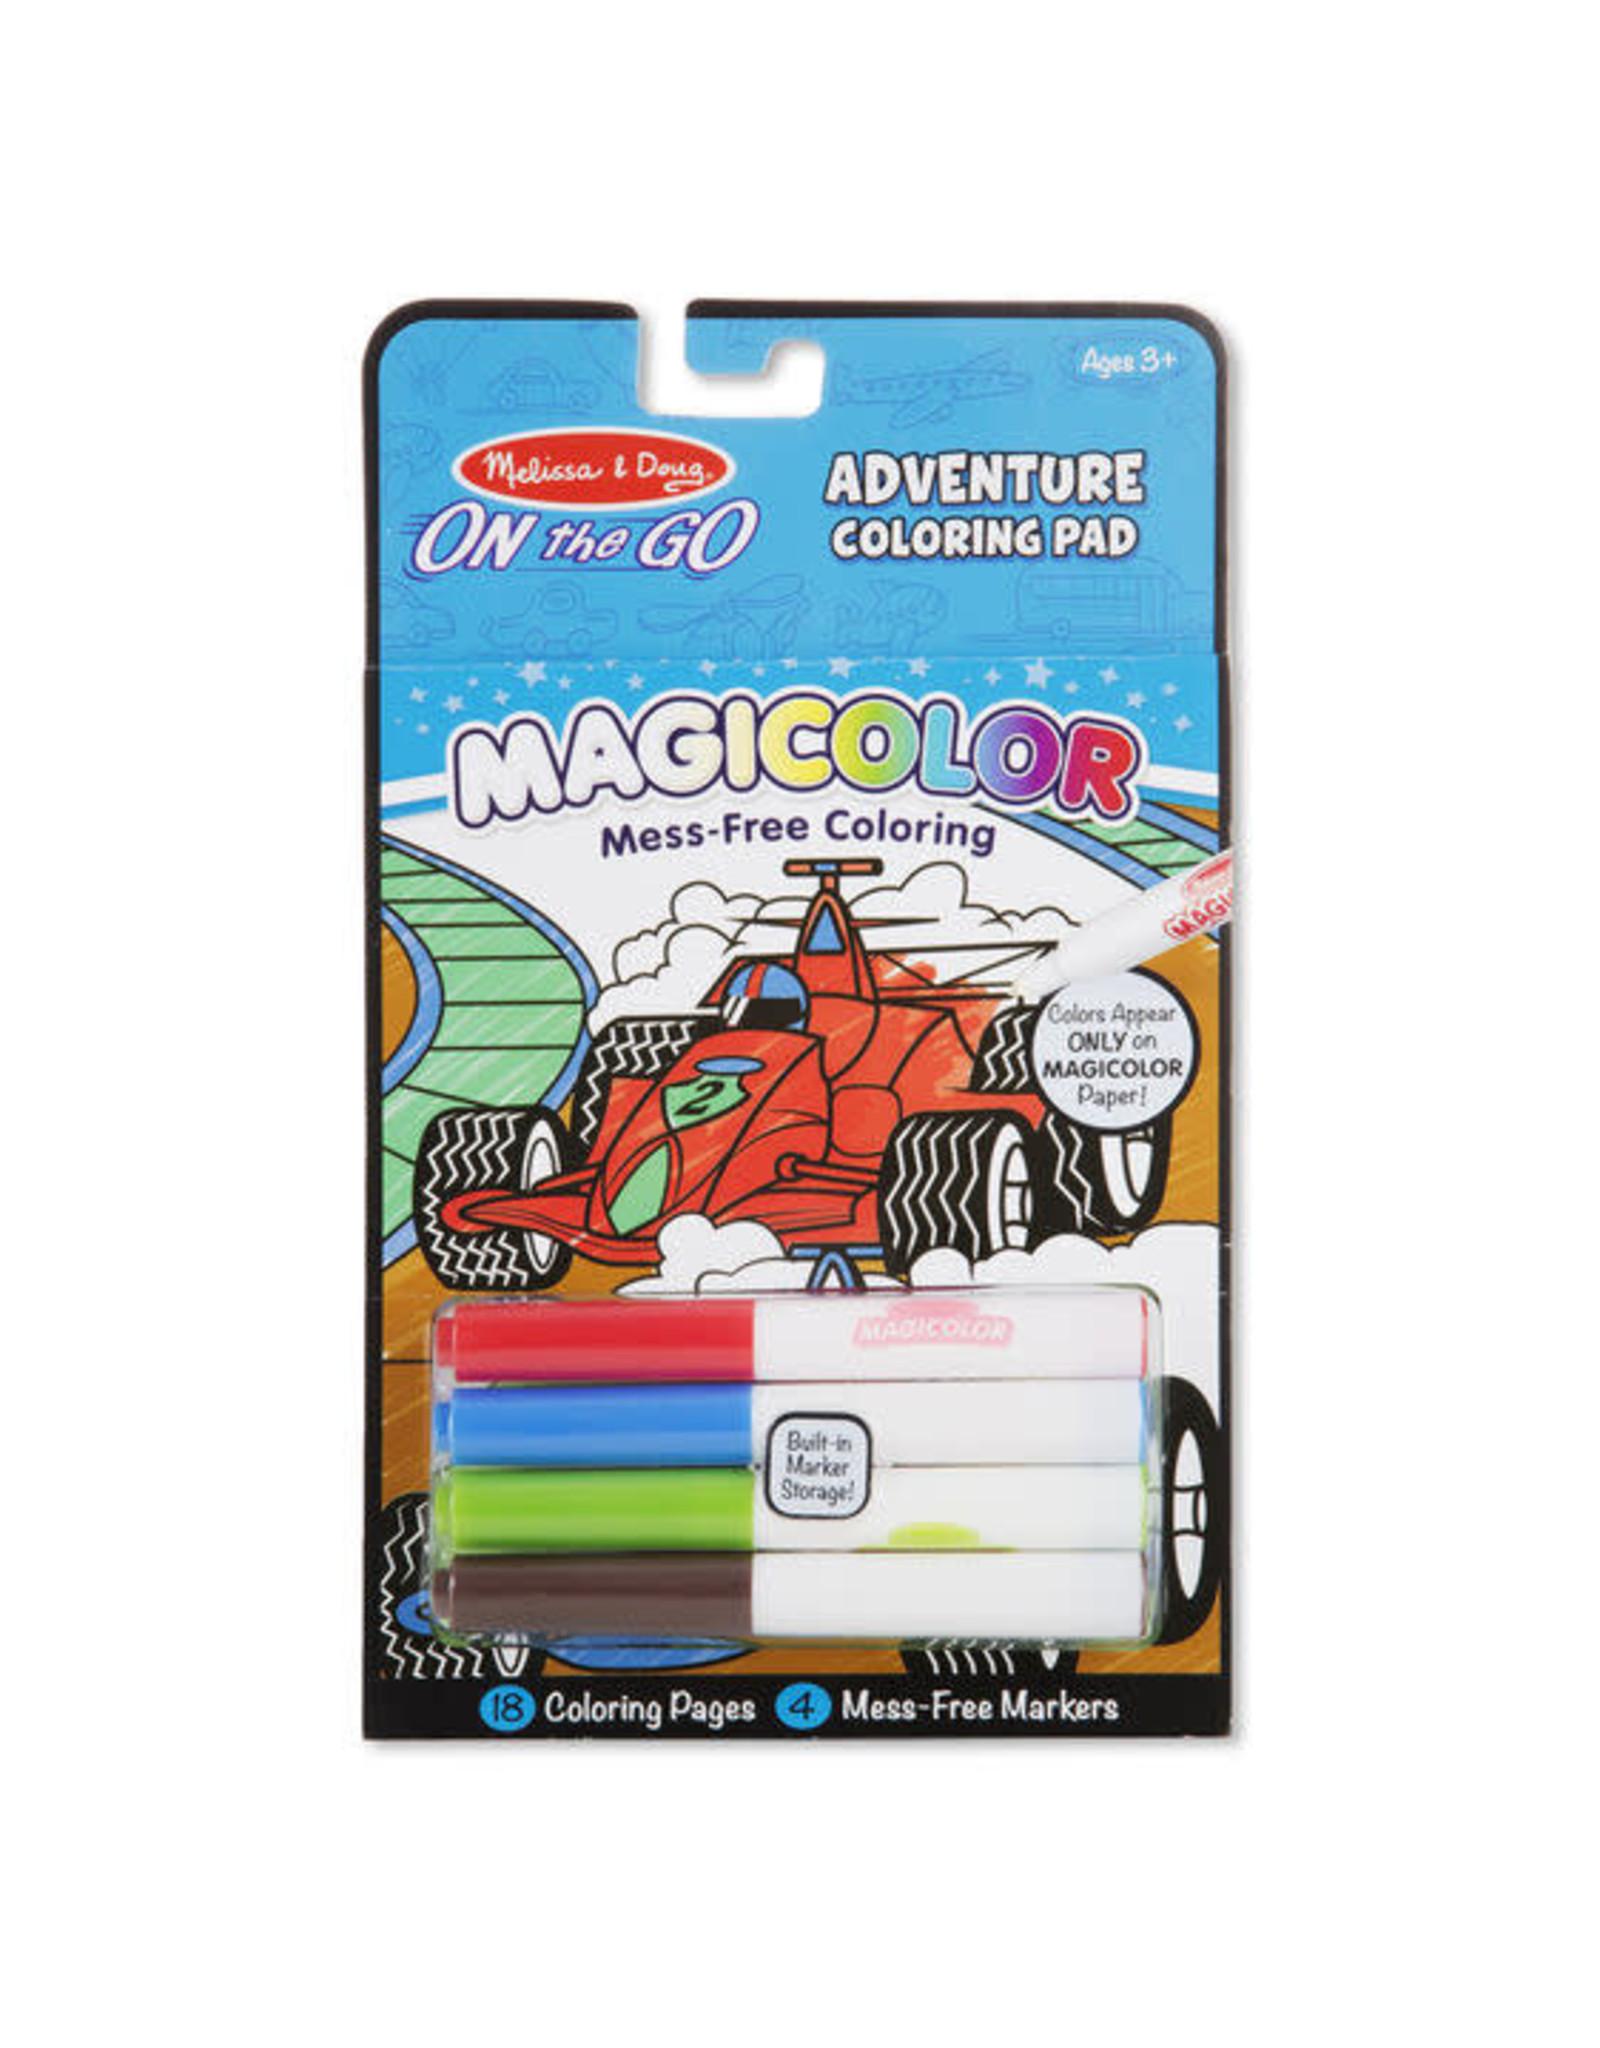 Melissa & Doug Magicolour Colouring Pad - Games and Adventures